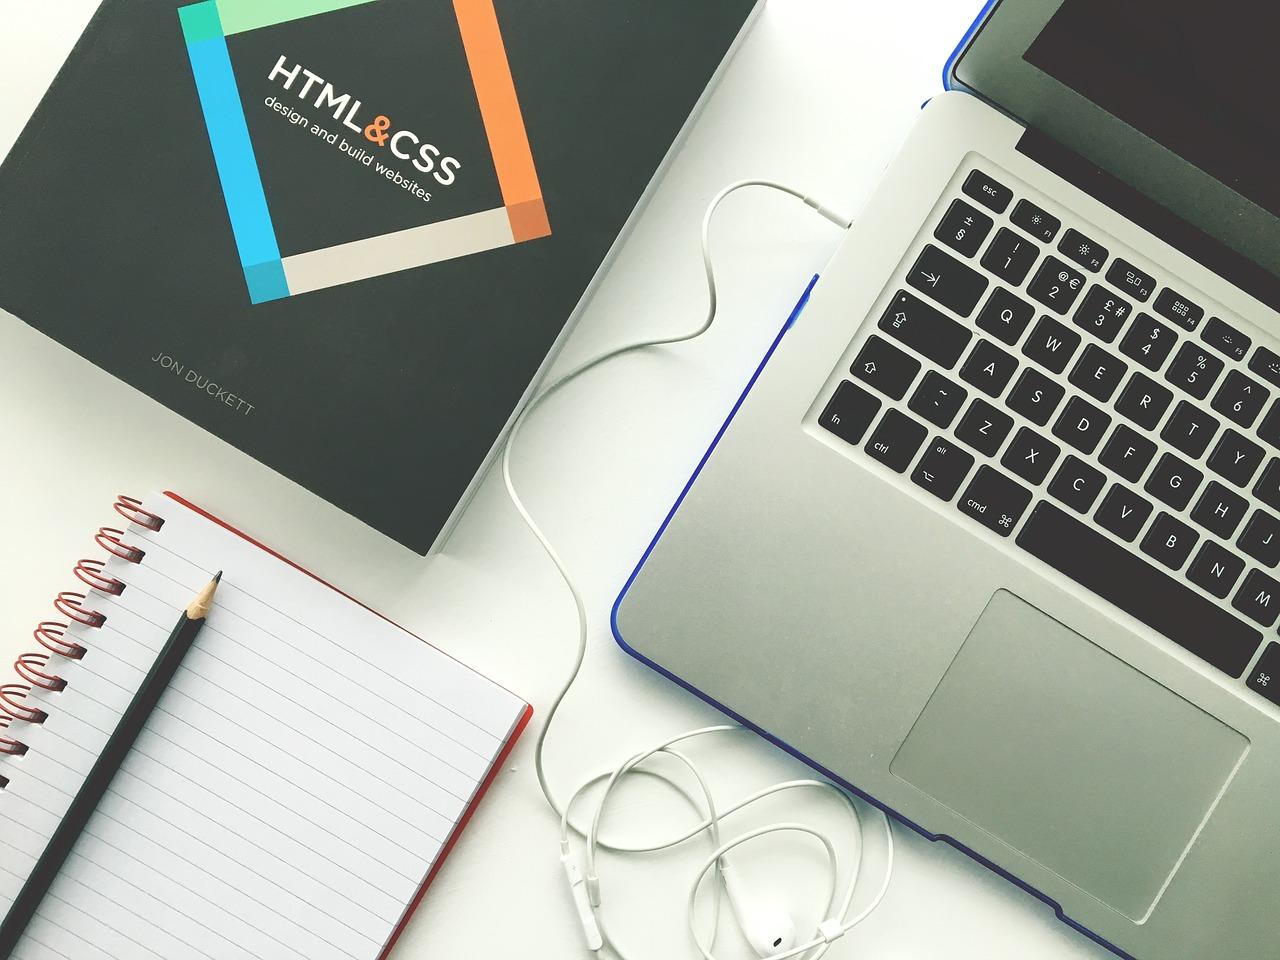 What is Important for Good Web Design? Gaurav Tiwari